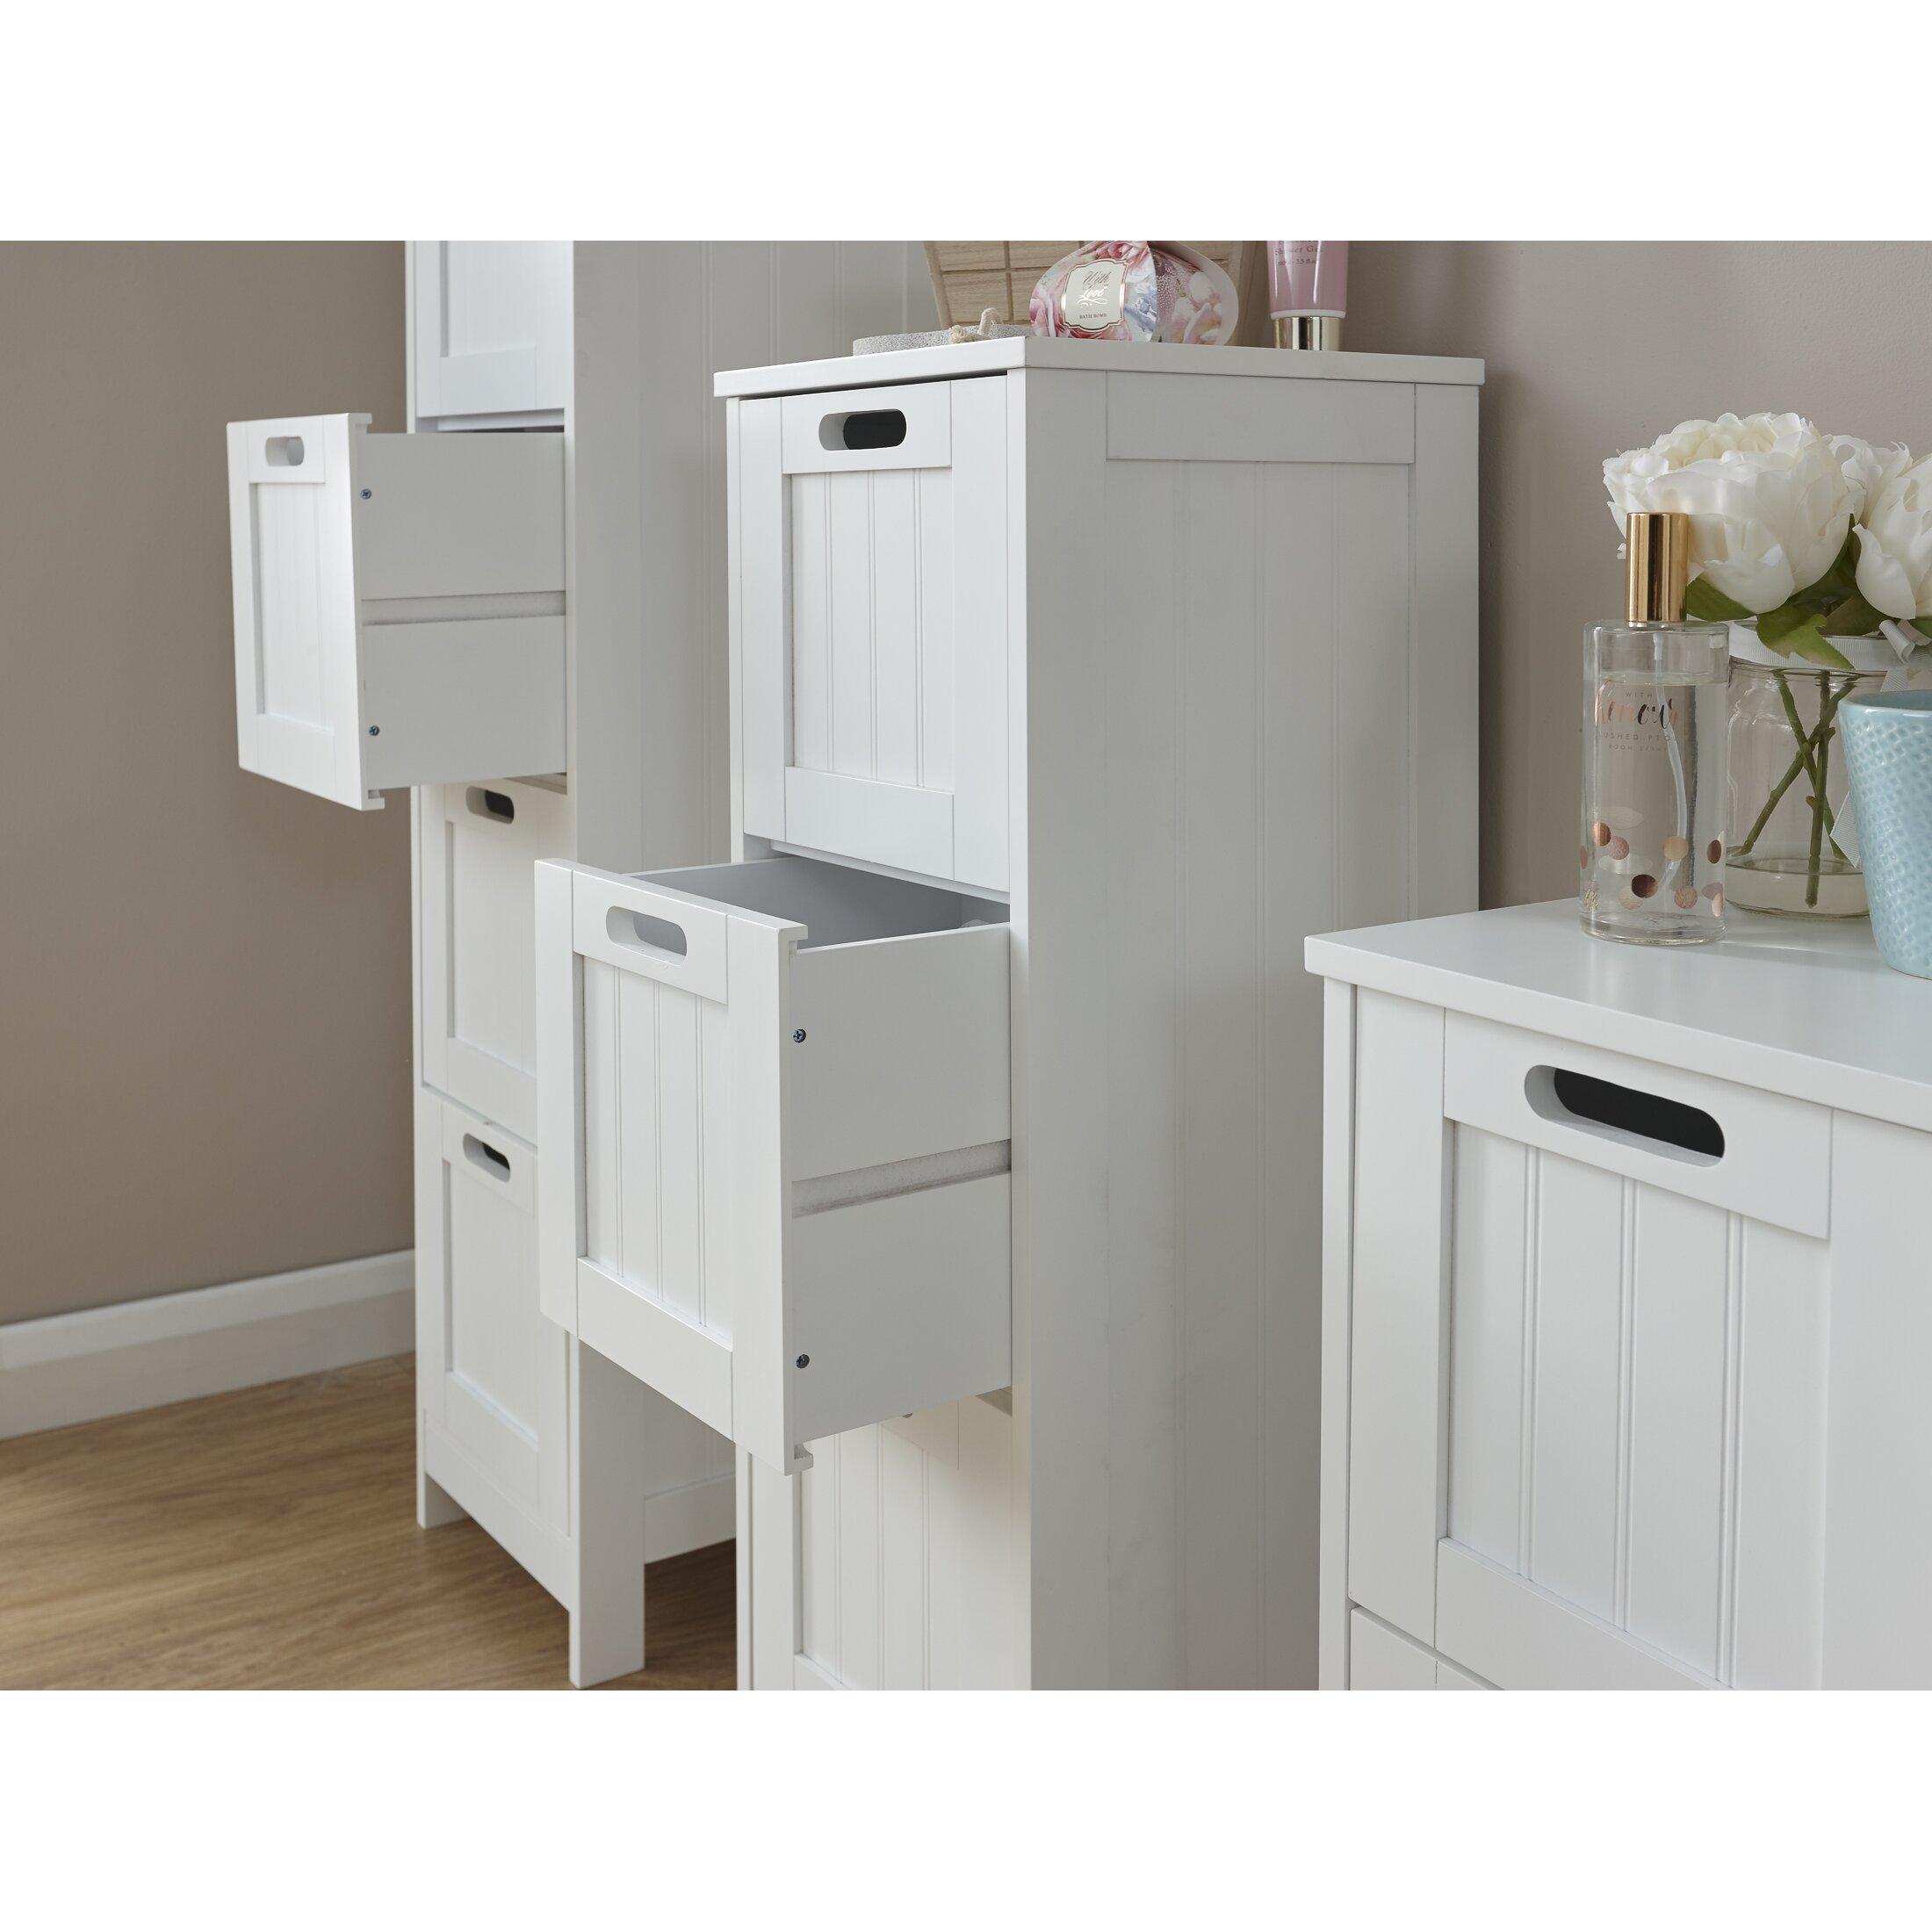 Tall Living Room Cabinets Homestead Living Thomson 30 X 120cm Free Standing Tall Bathroom